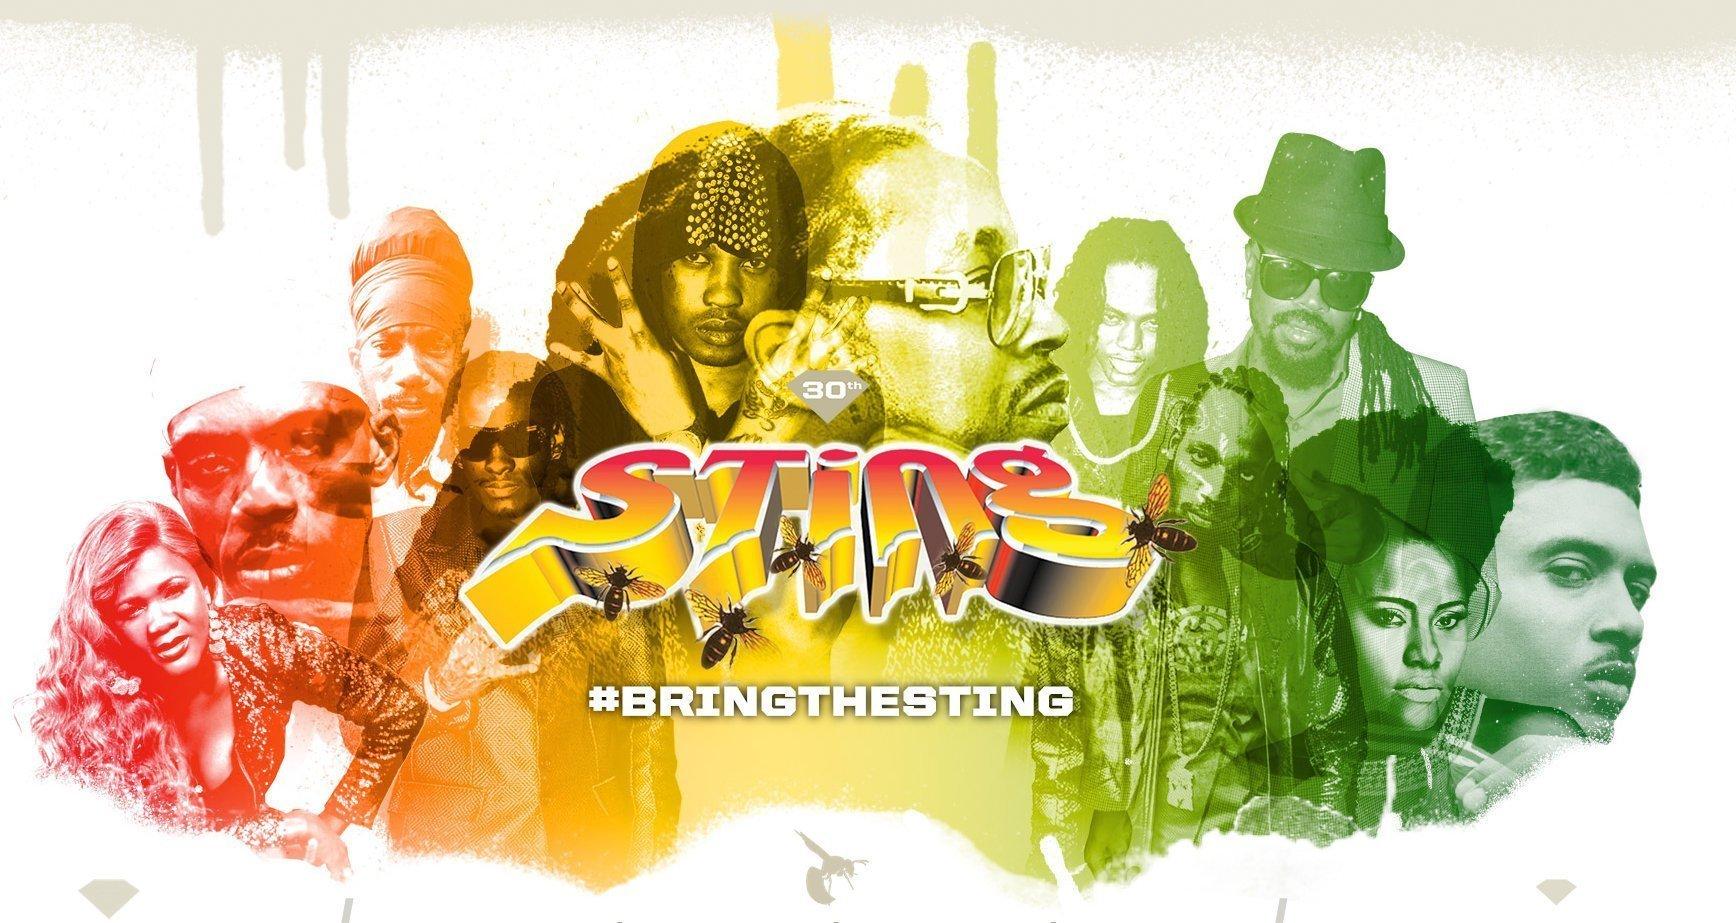 Sting 2013